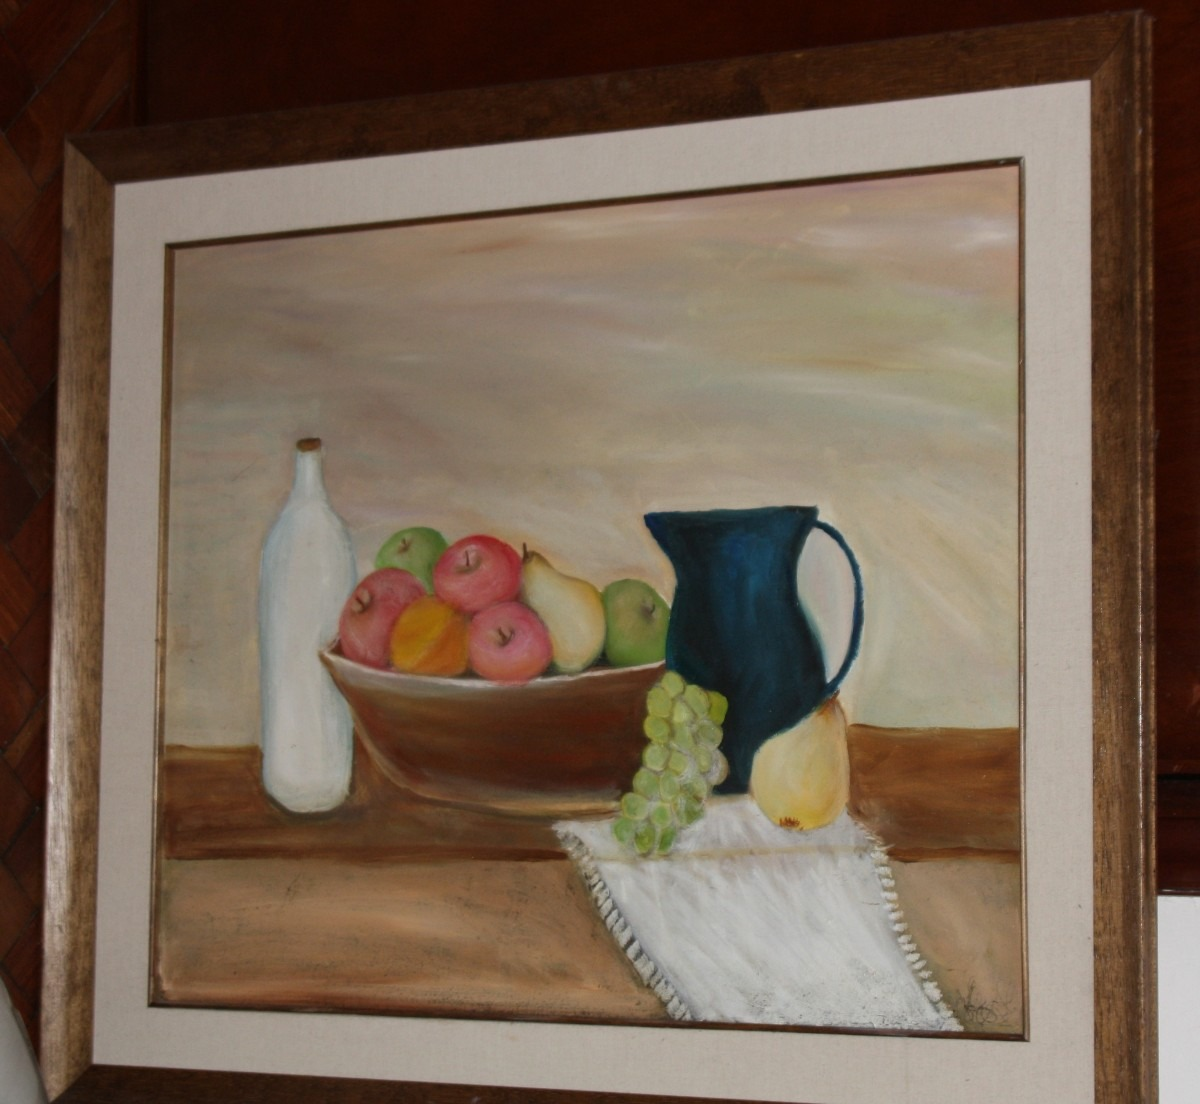 Cuadros pintados al leo 50 x 70 cm aprox for Cuadros pintados al oleo